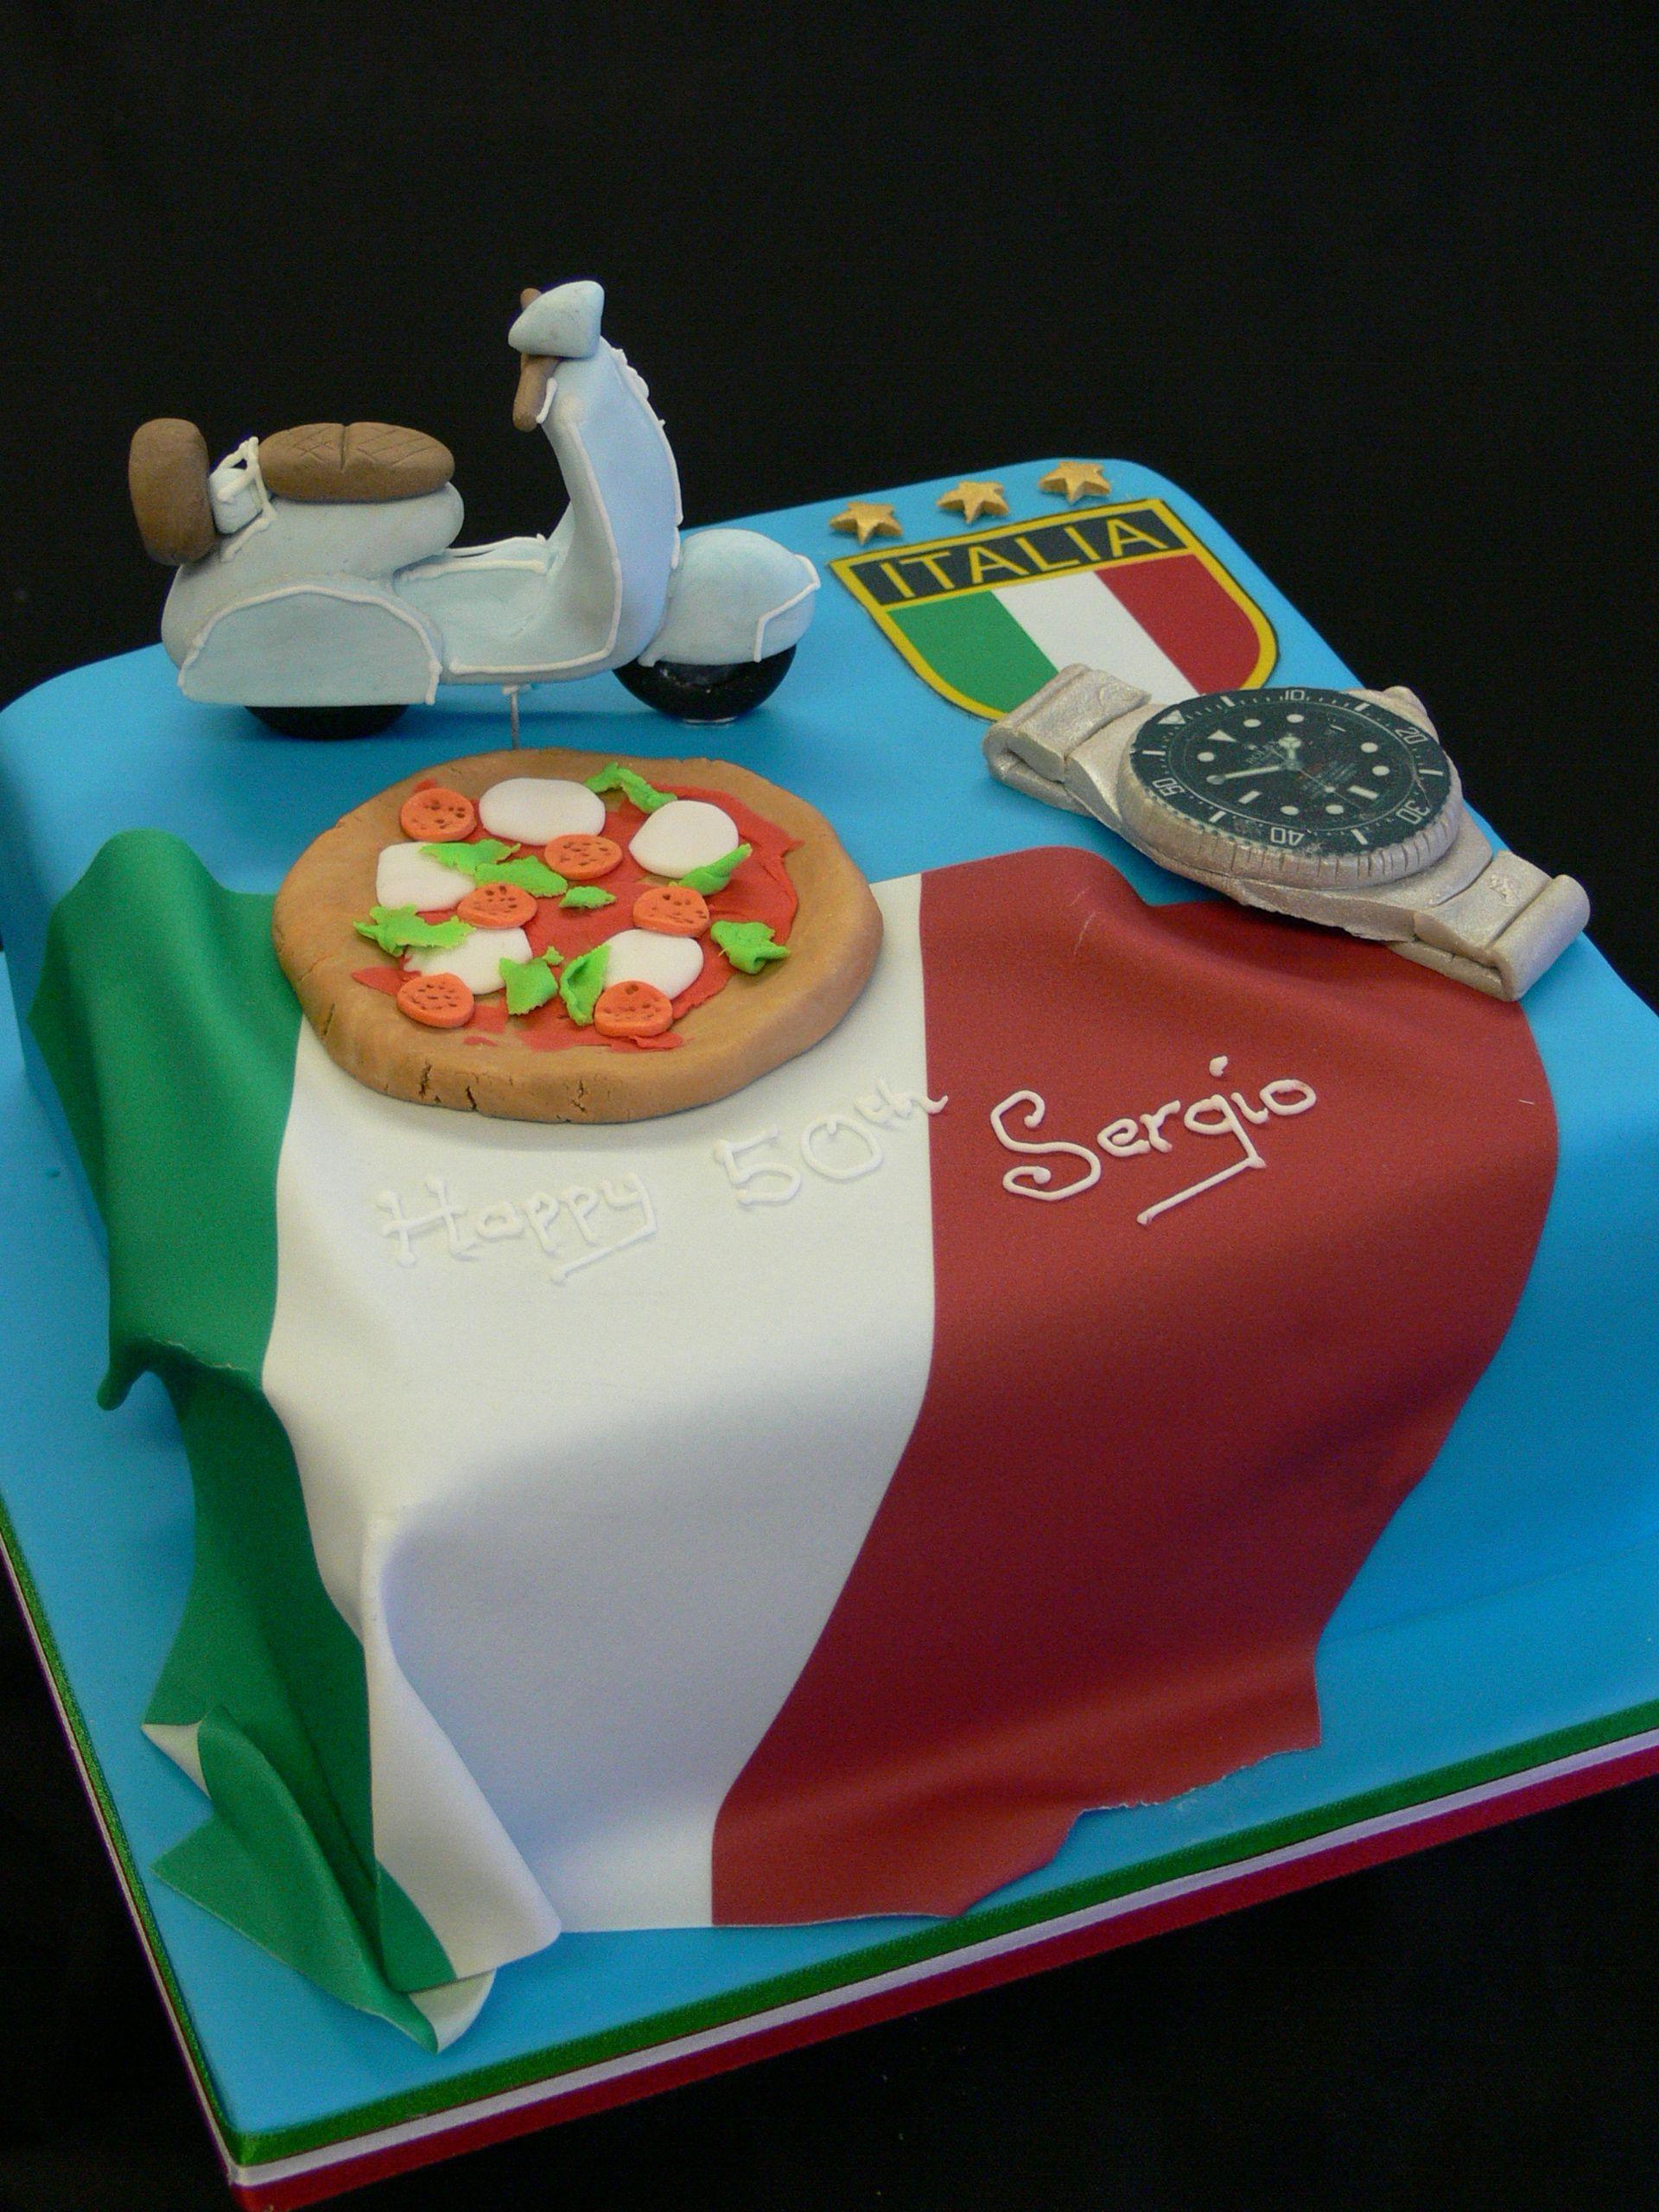 Franchising Cake Design Italia : #Italian themed birthday cake #Vespa #Rolex #pizza Cakes ...